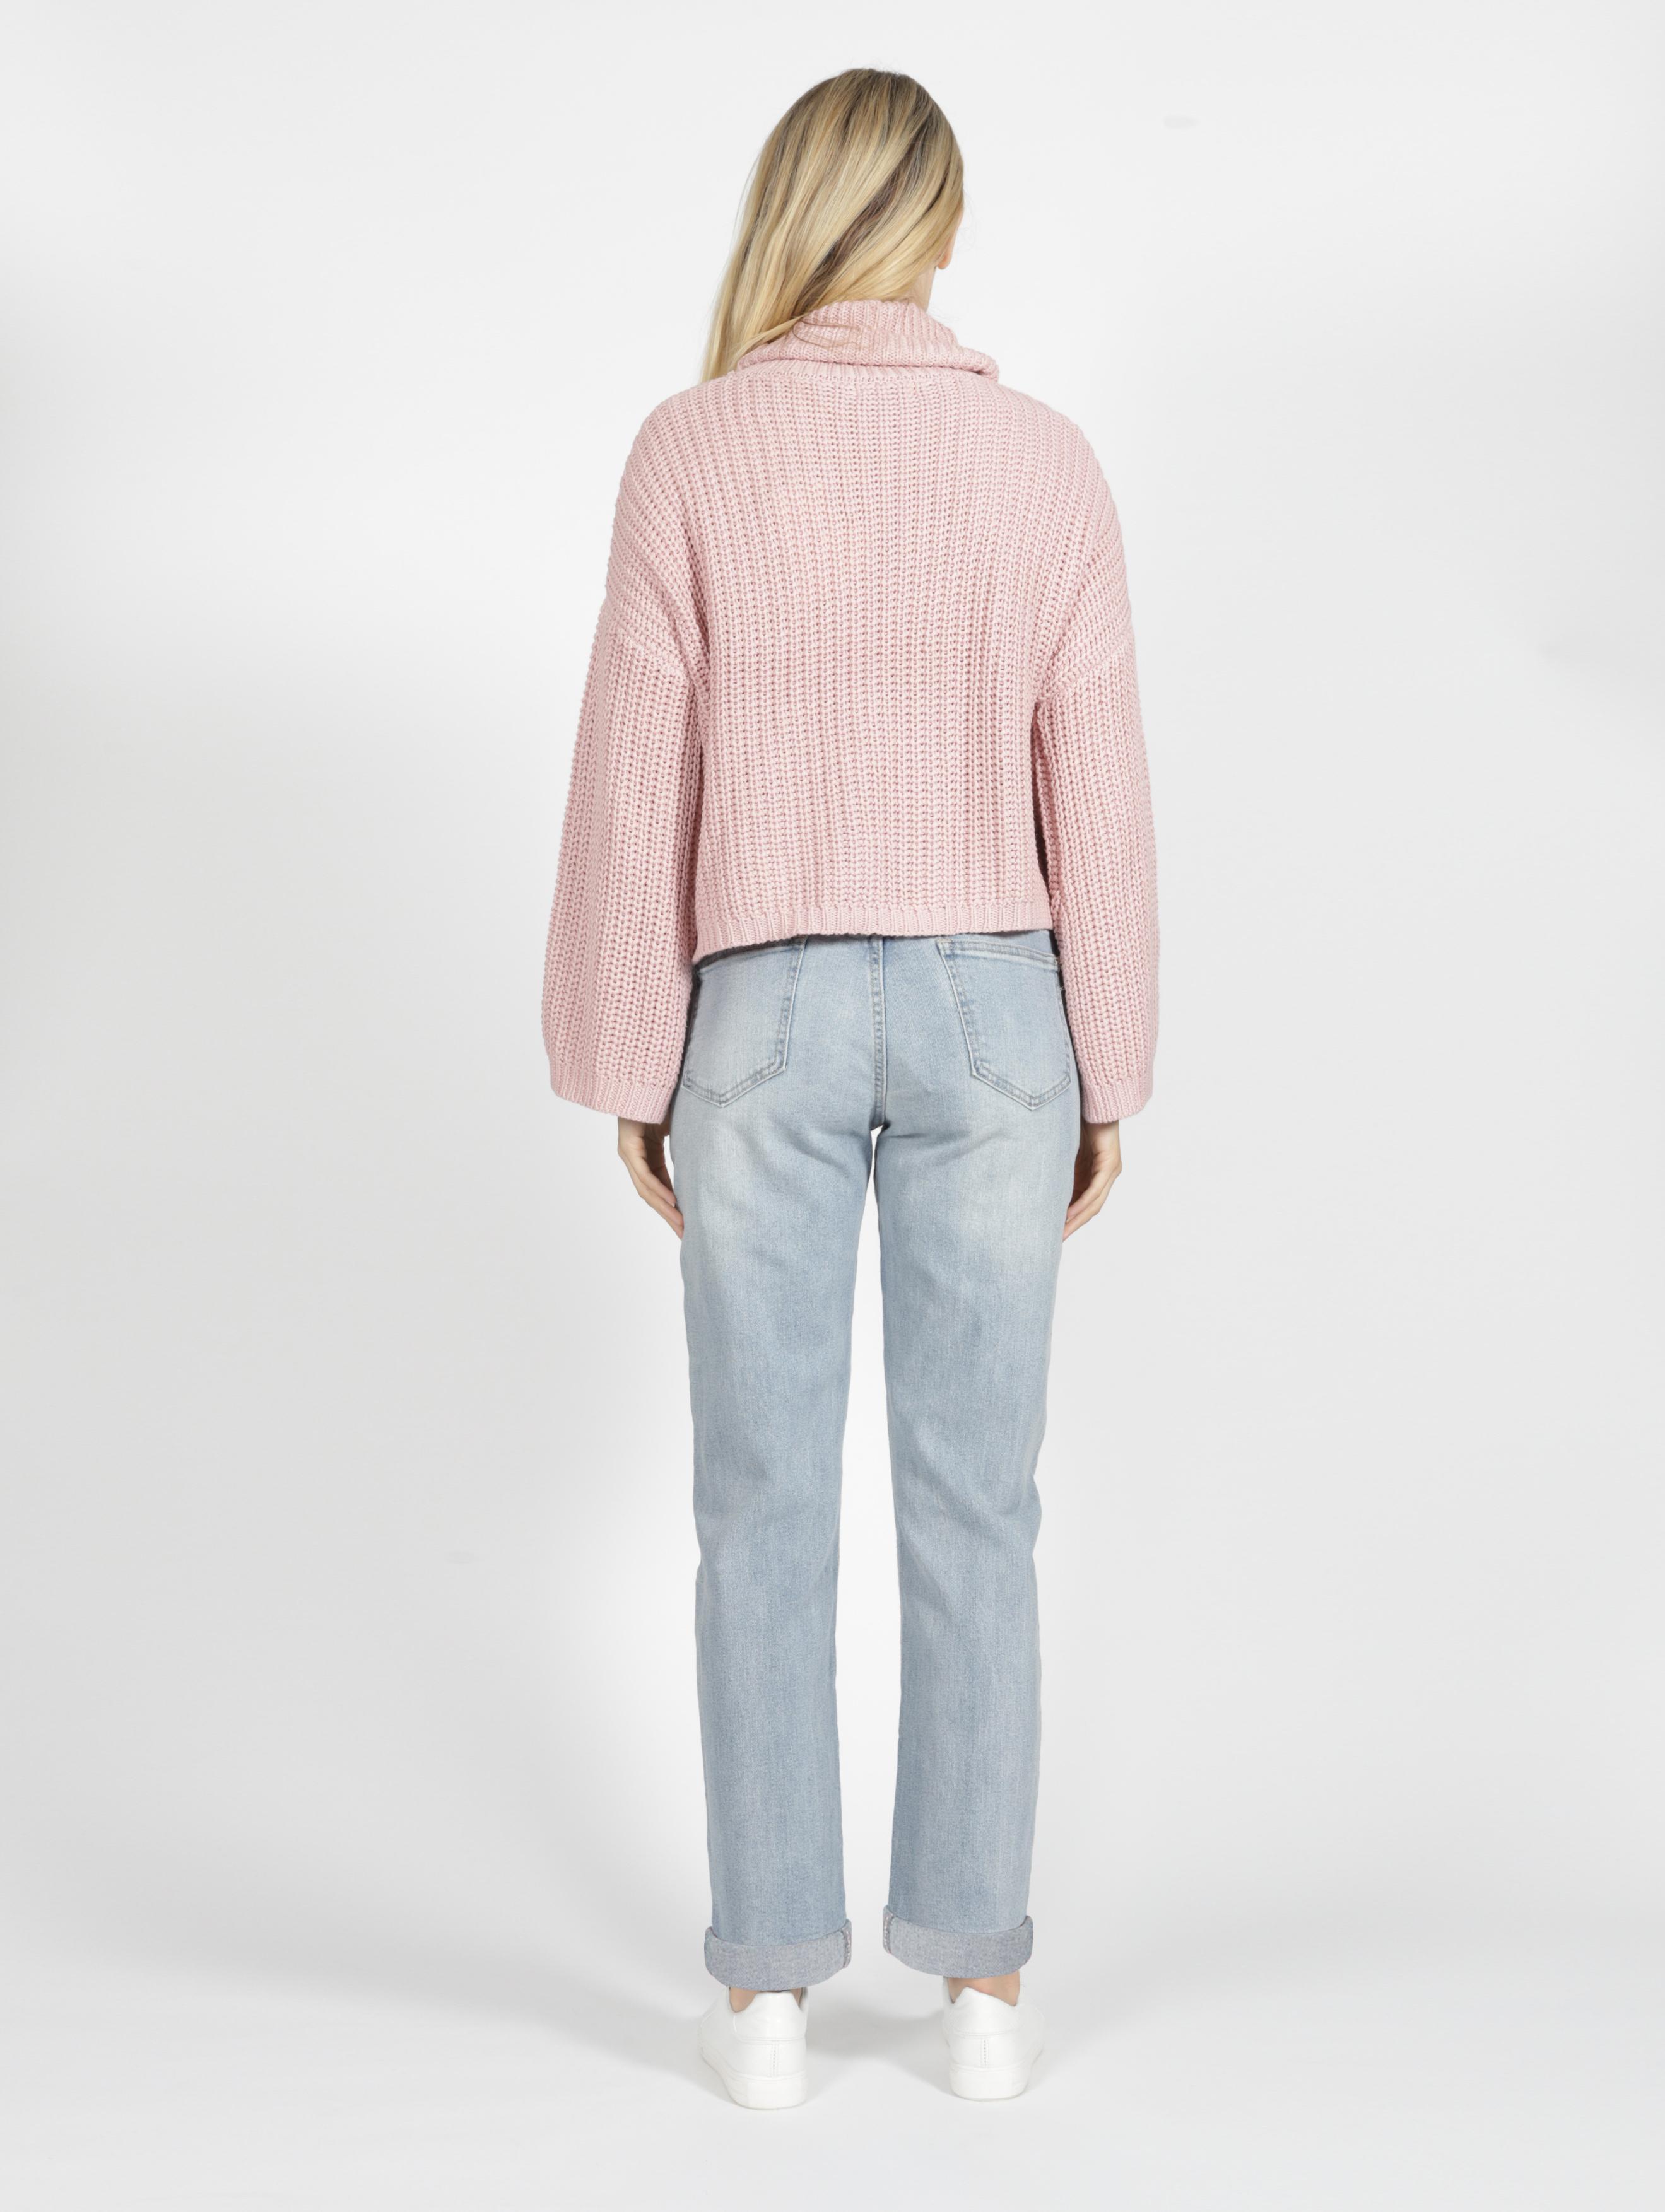 Sass Jules Knit Blush Pink